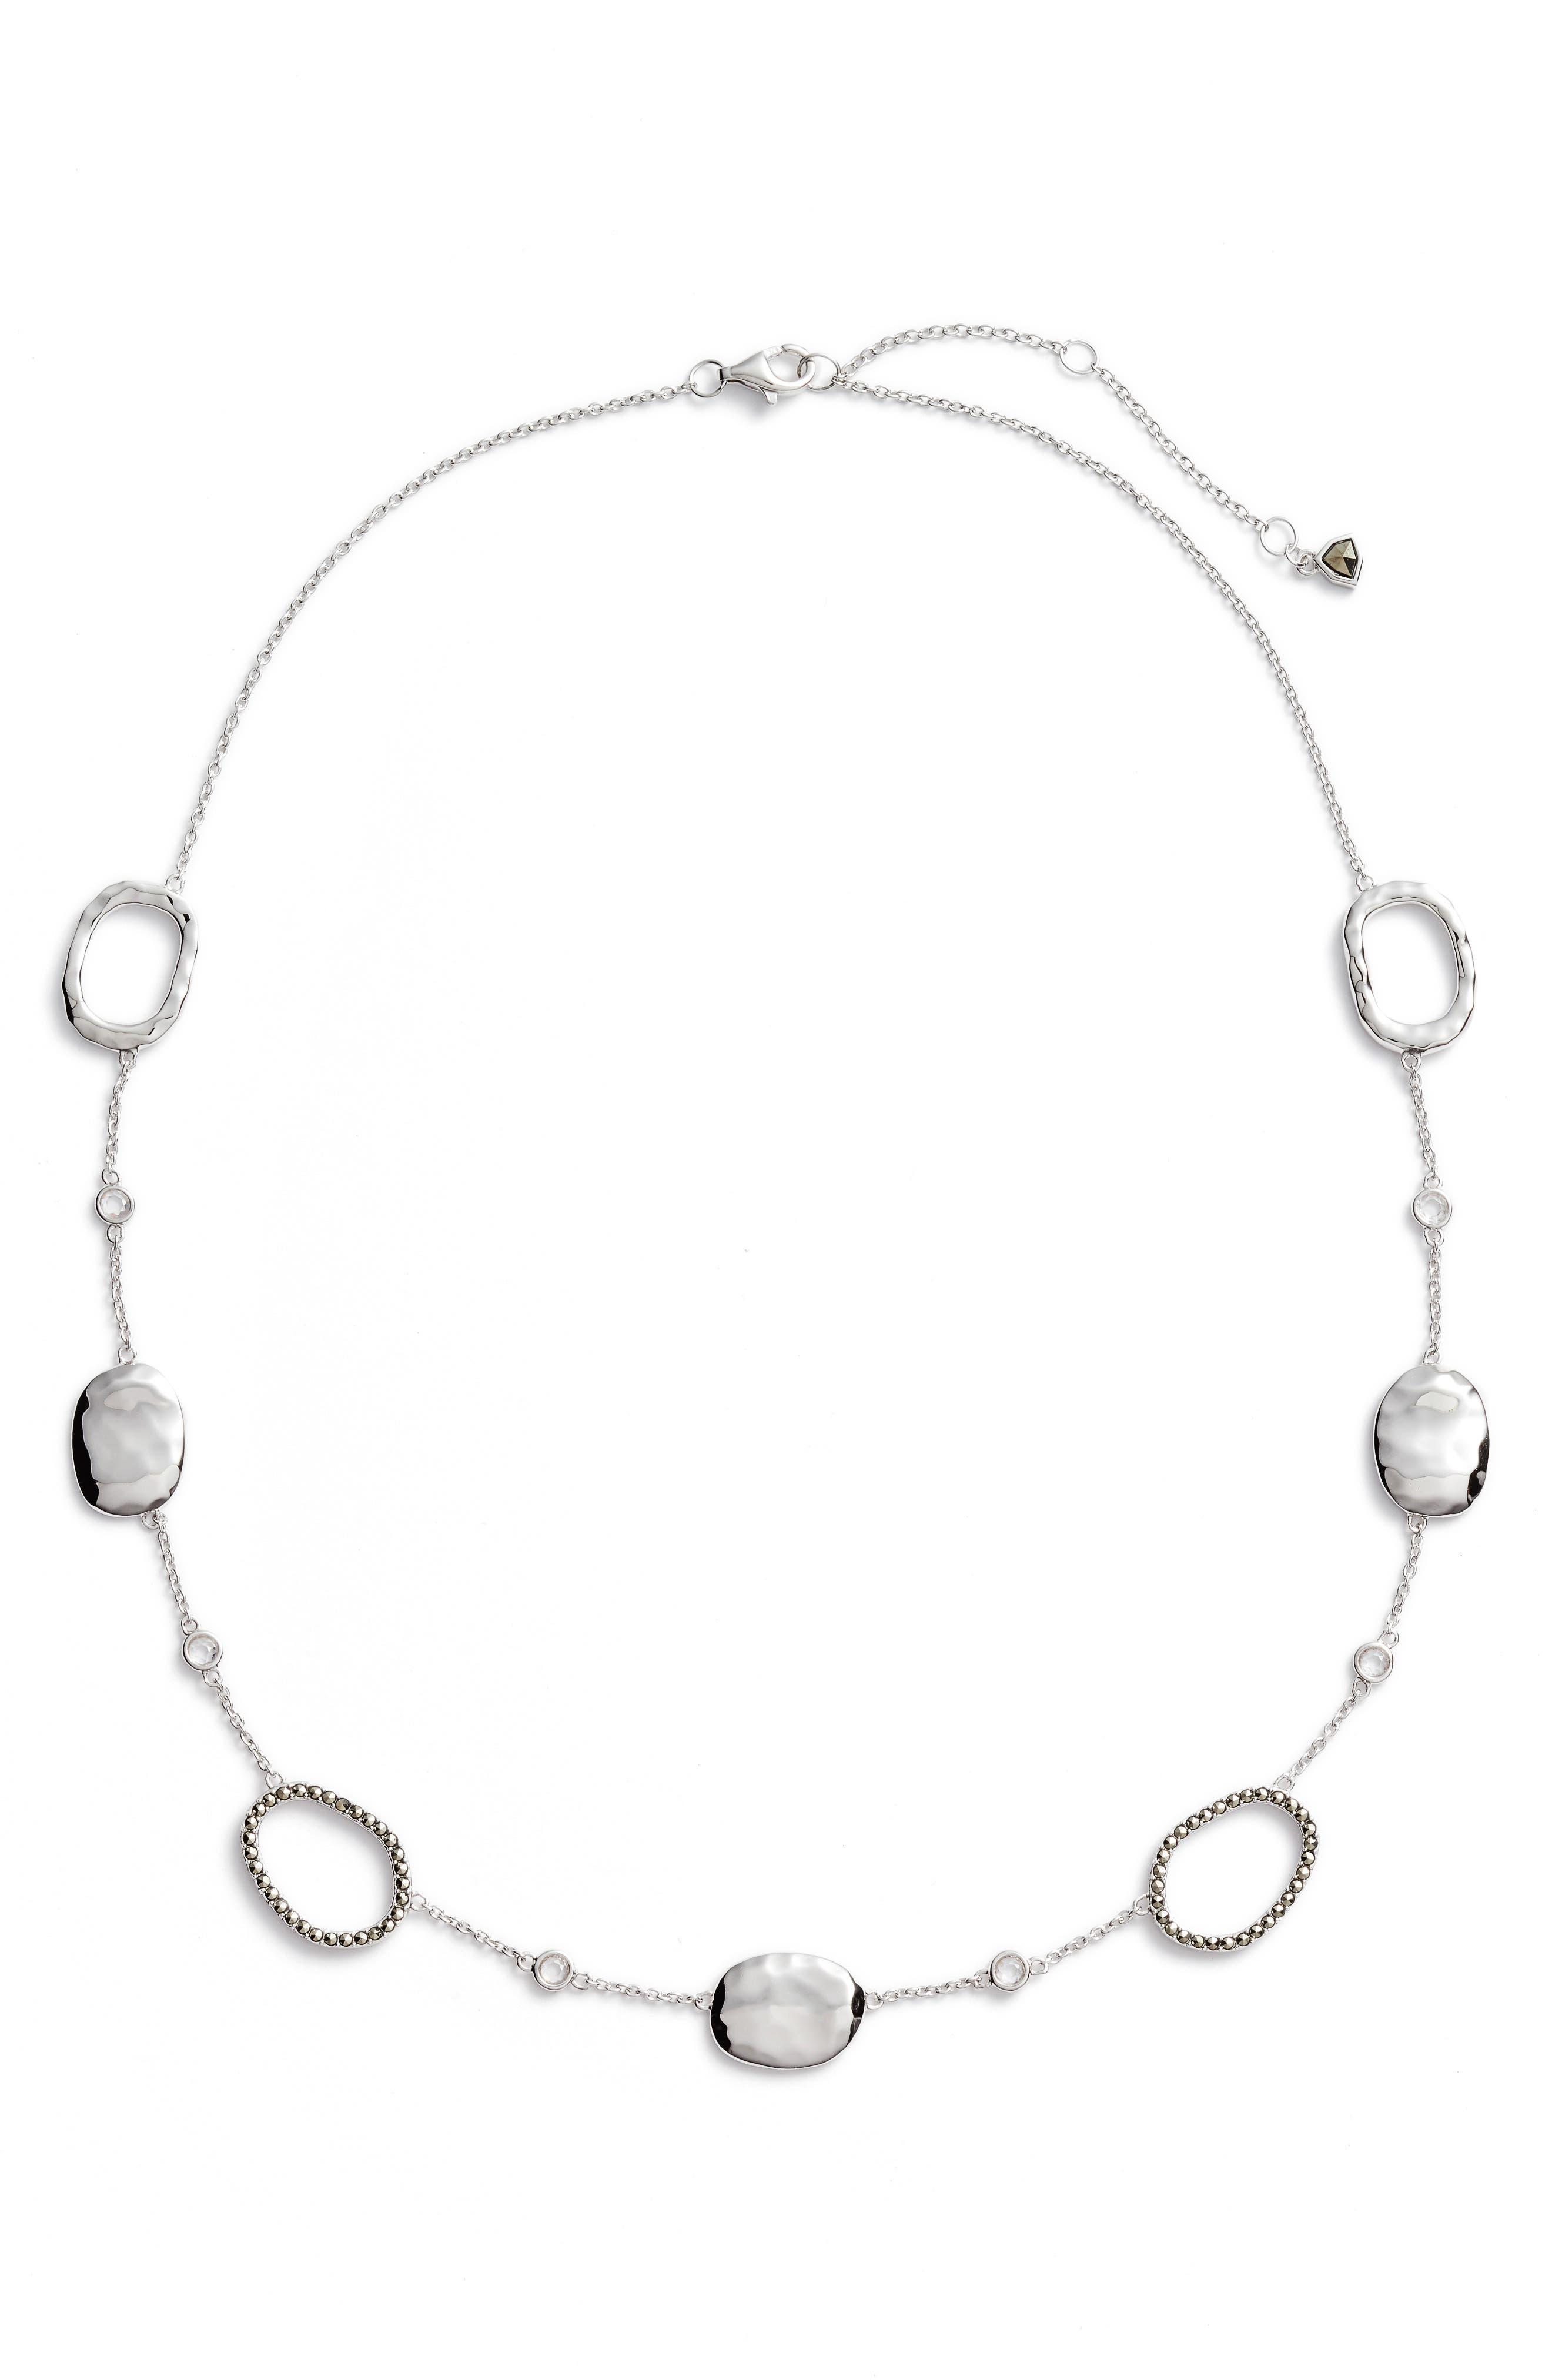 Main Image - Judith Jack Crystal Collar Necklace